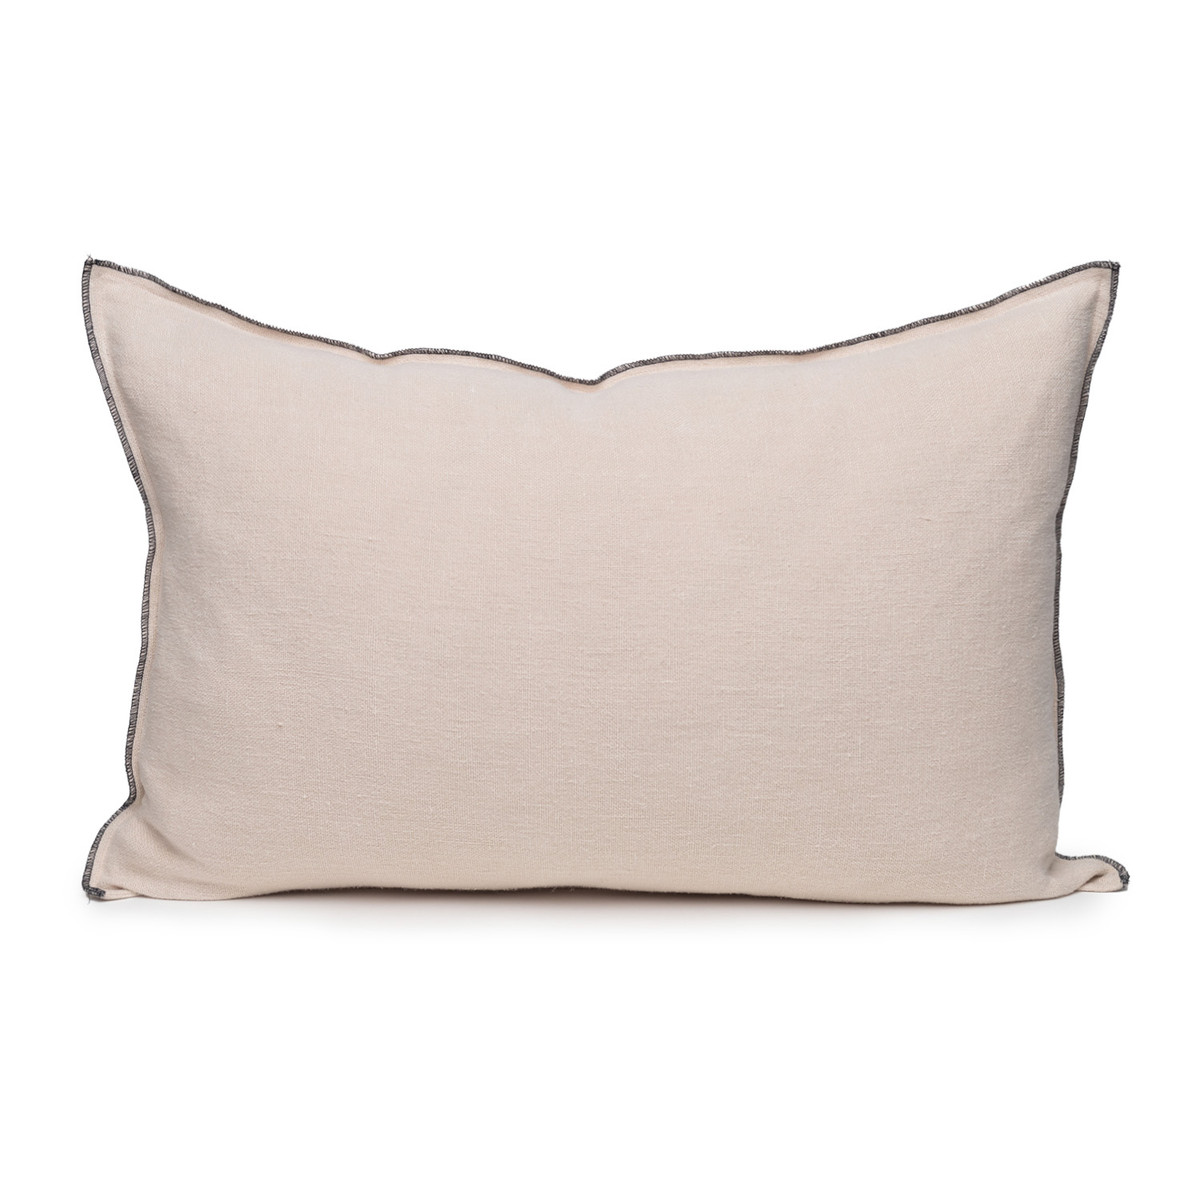 Santal Linen Pillow 1826 - Creme Brulee - Front View